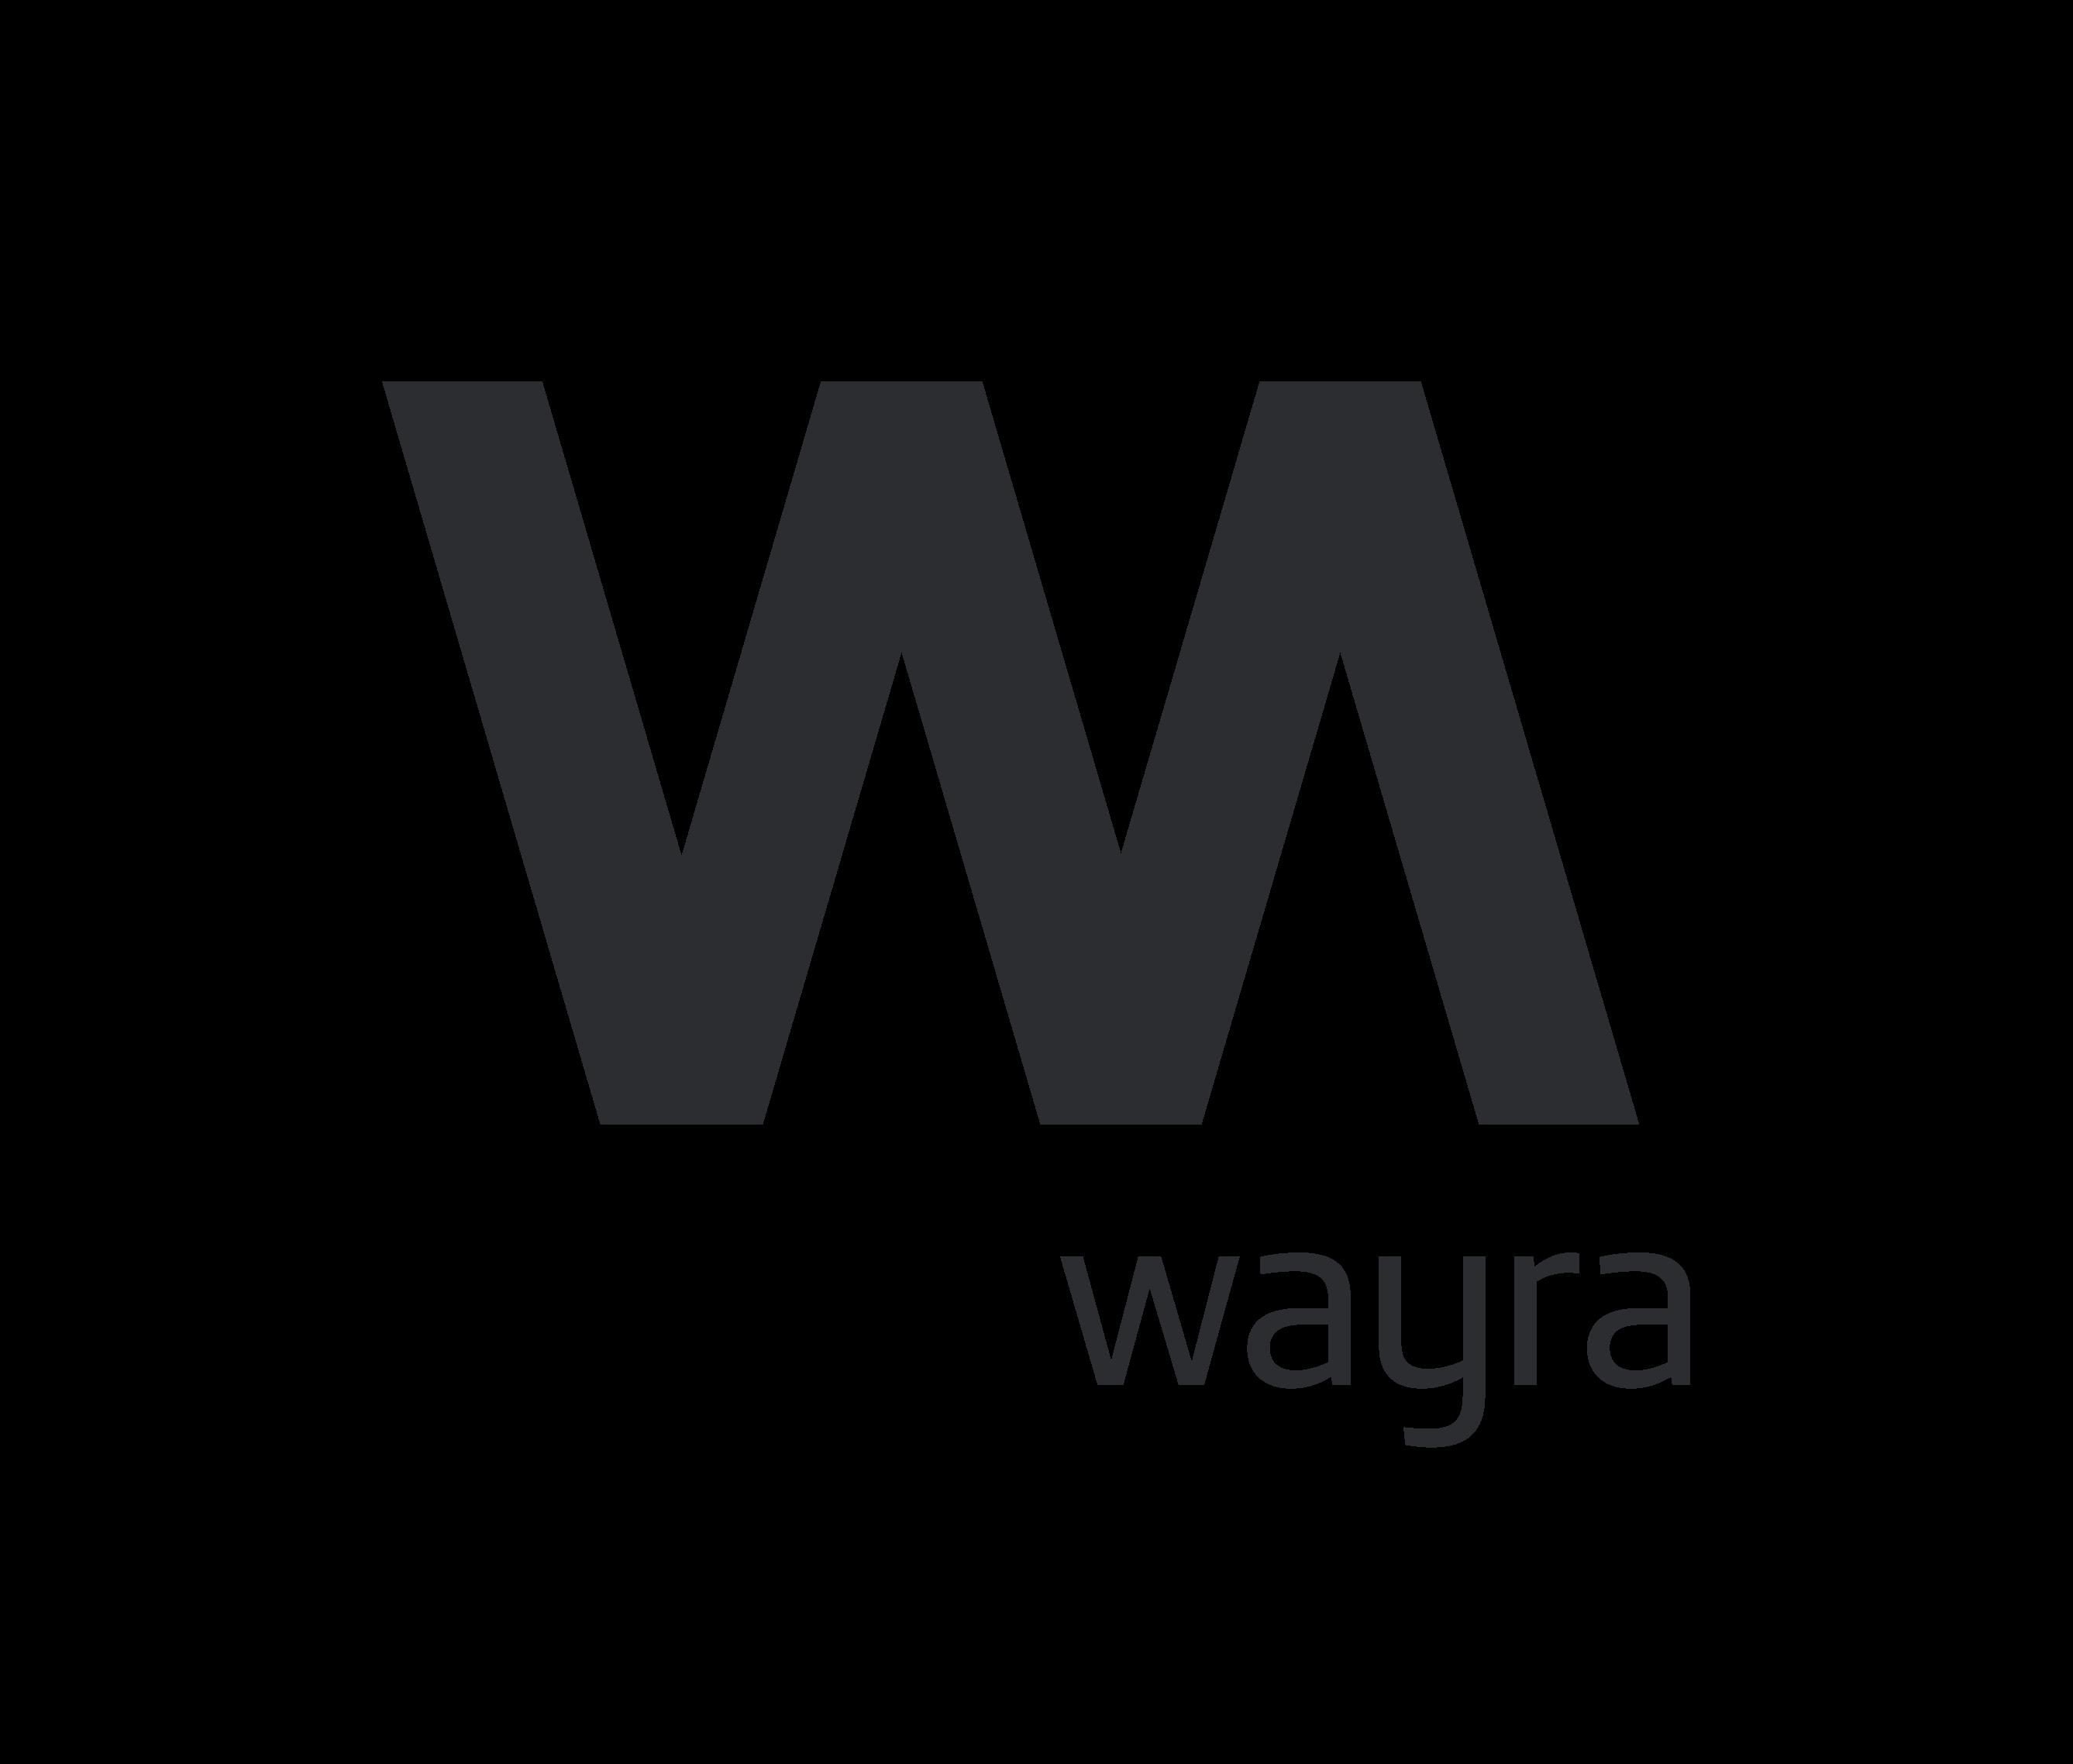 Wayra UK Partners & Sponsors